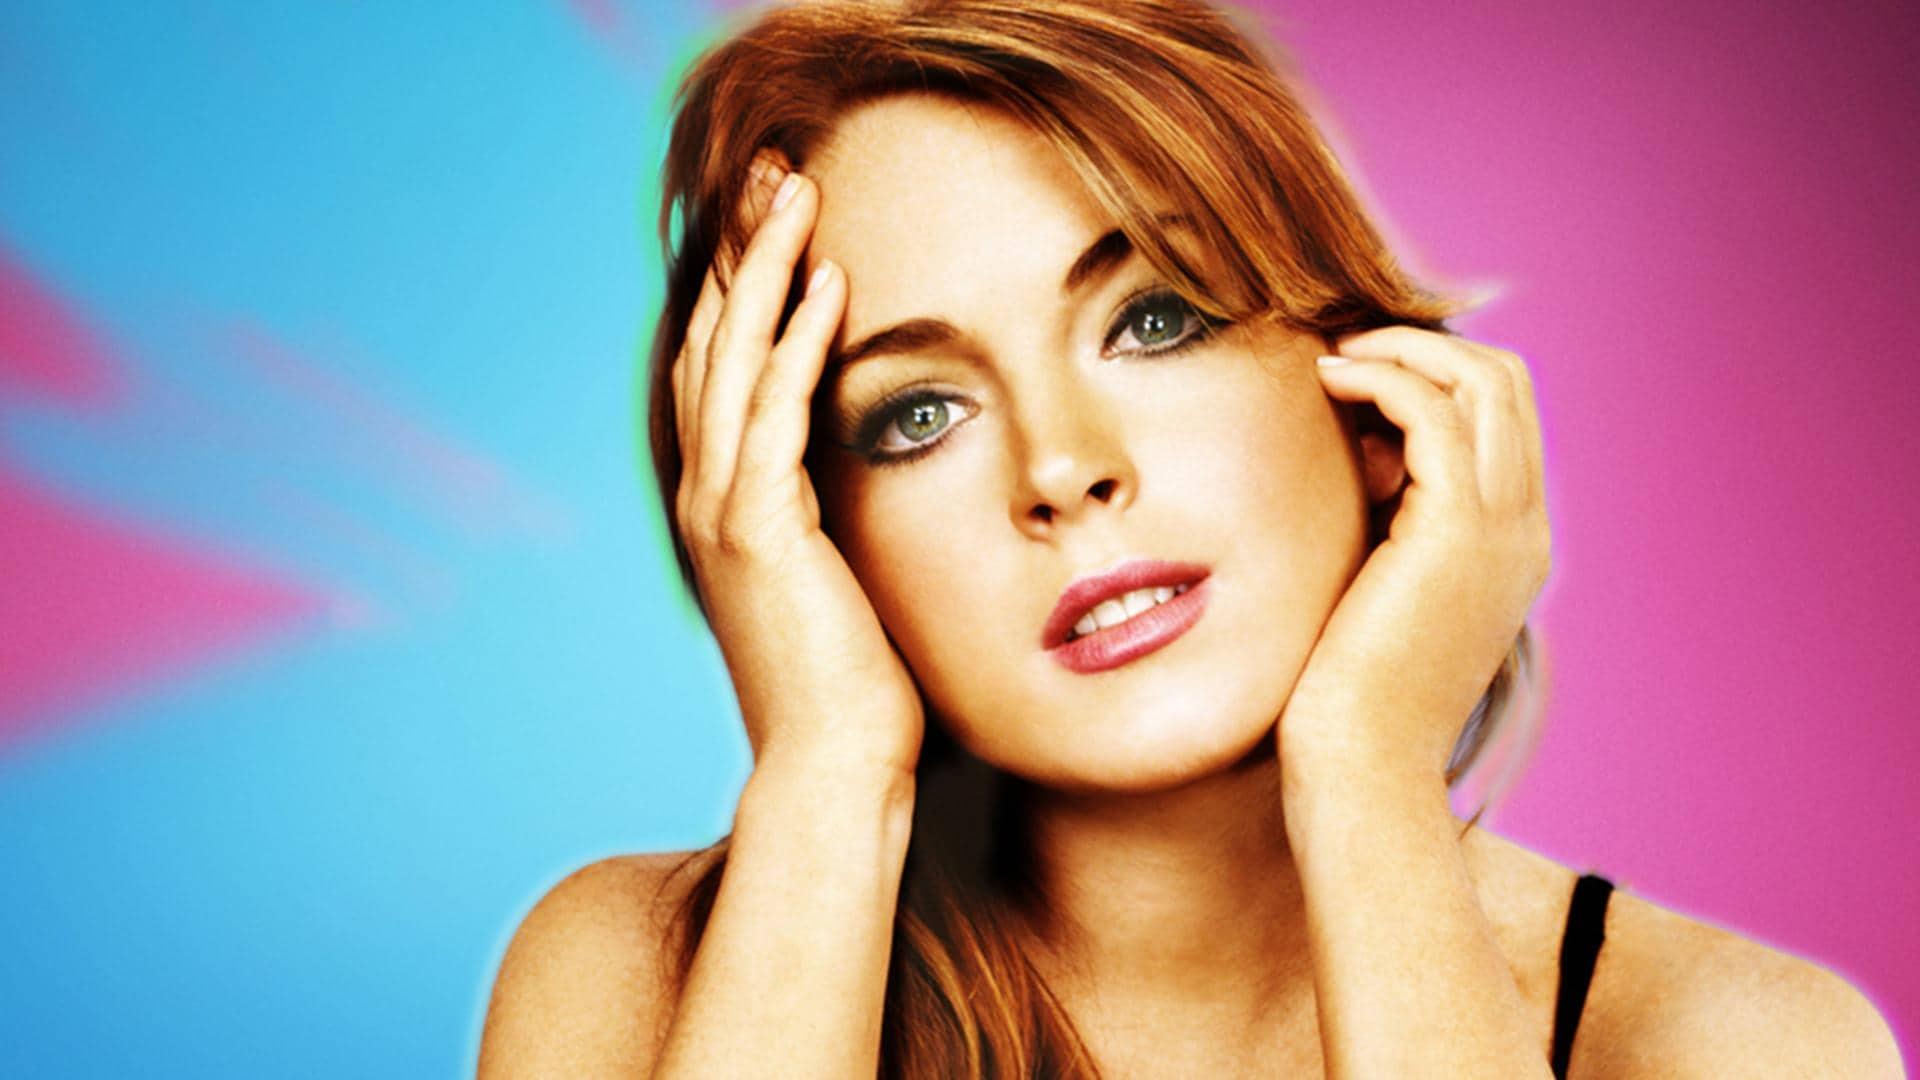 Lindsay Lohan: May 1, 2004